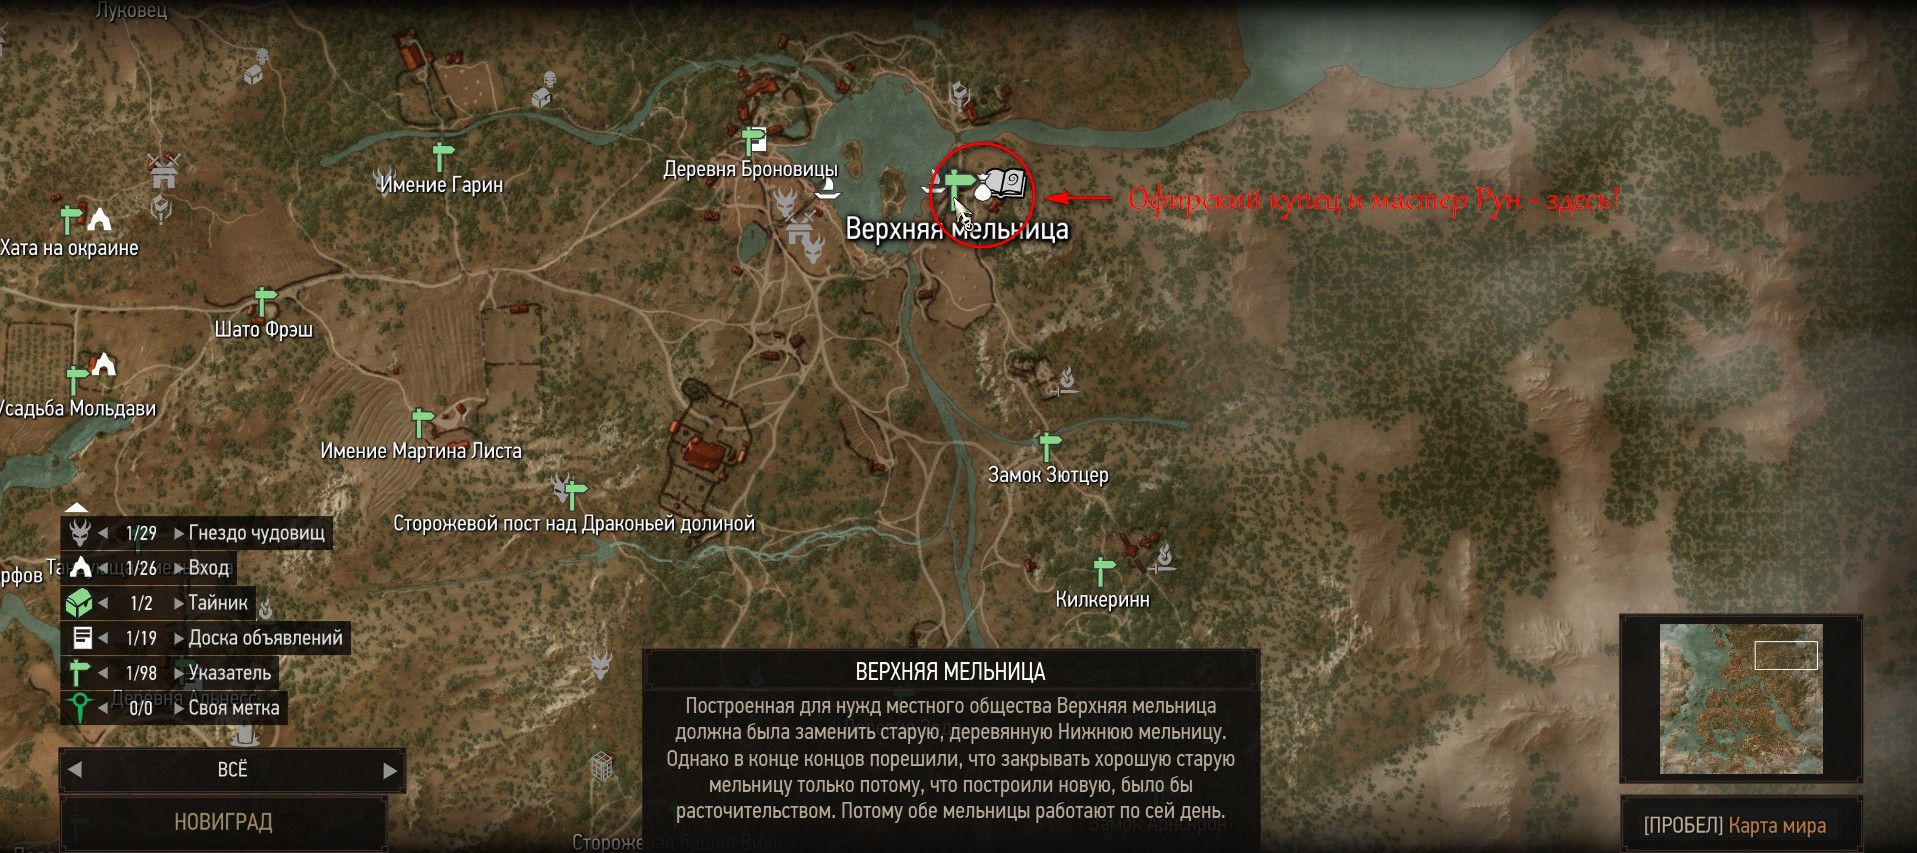 офф барыга нахождение.jpg - Witcher 3: Wild Hunt, the